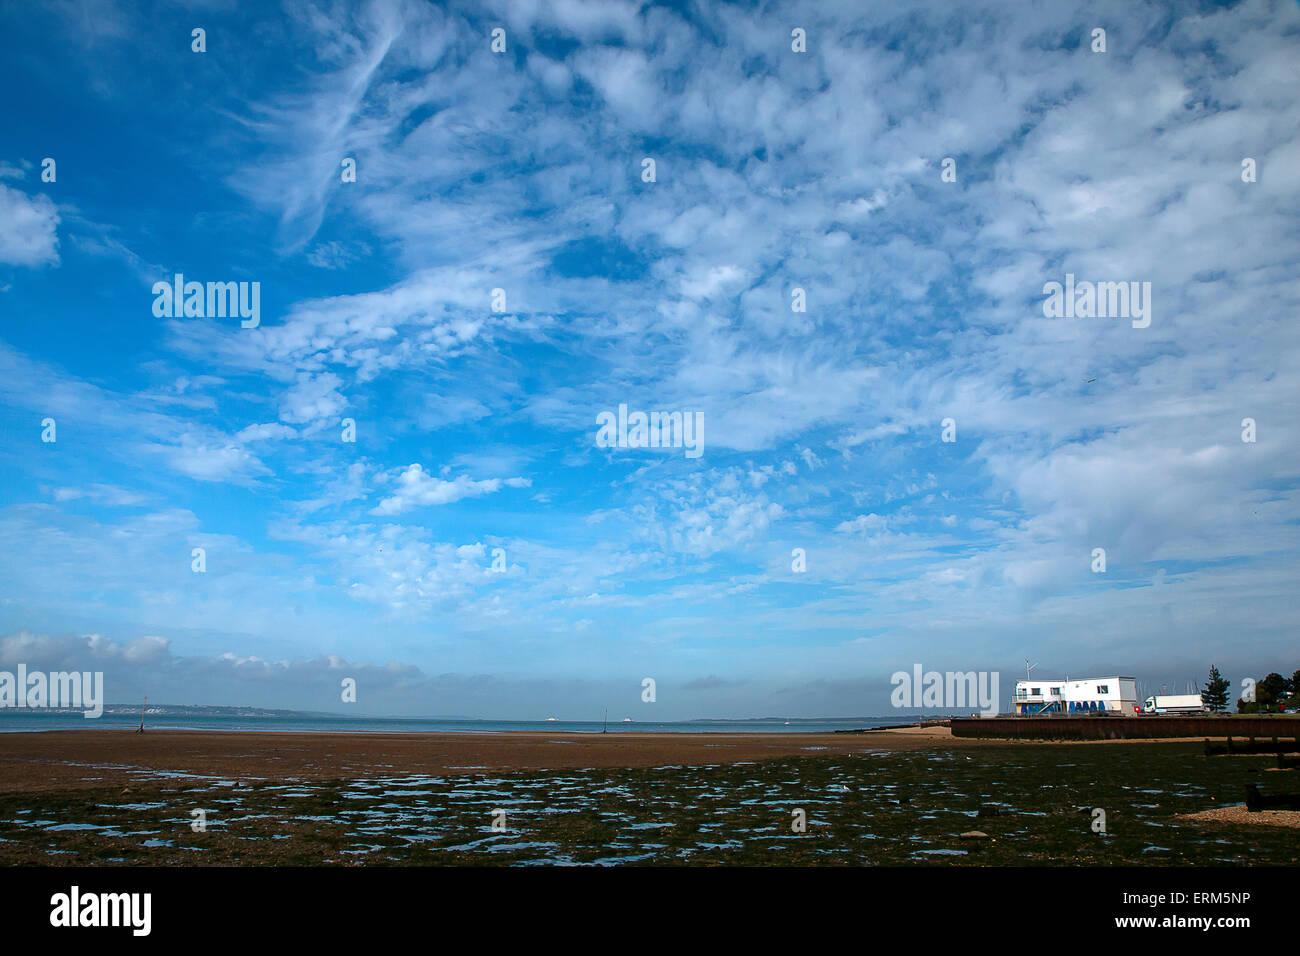 Dramatic Blue Sky at Meon Shore Hampshire, England - Stock Image